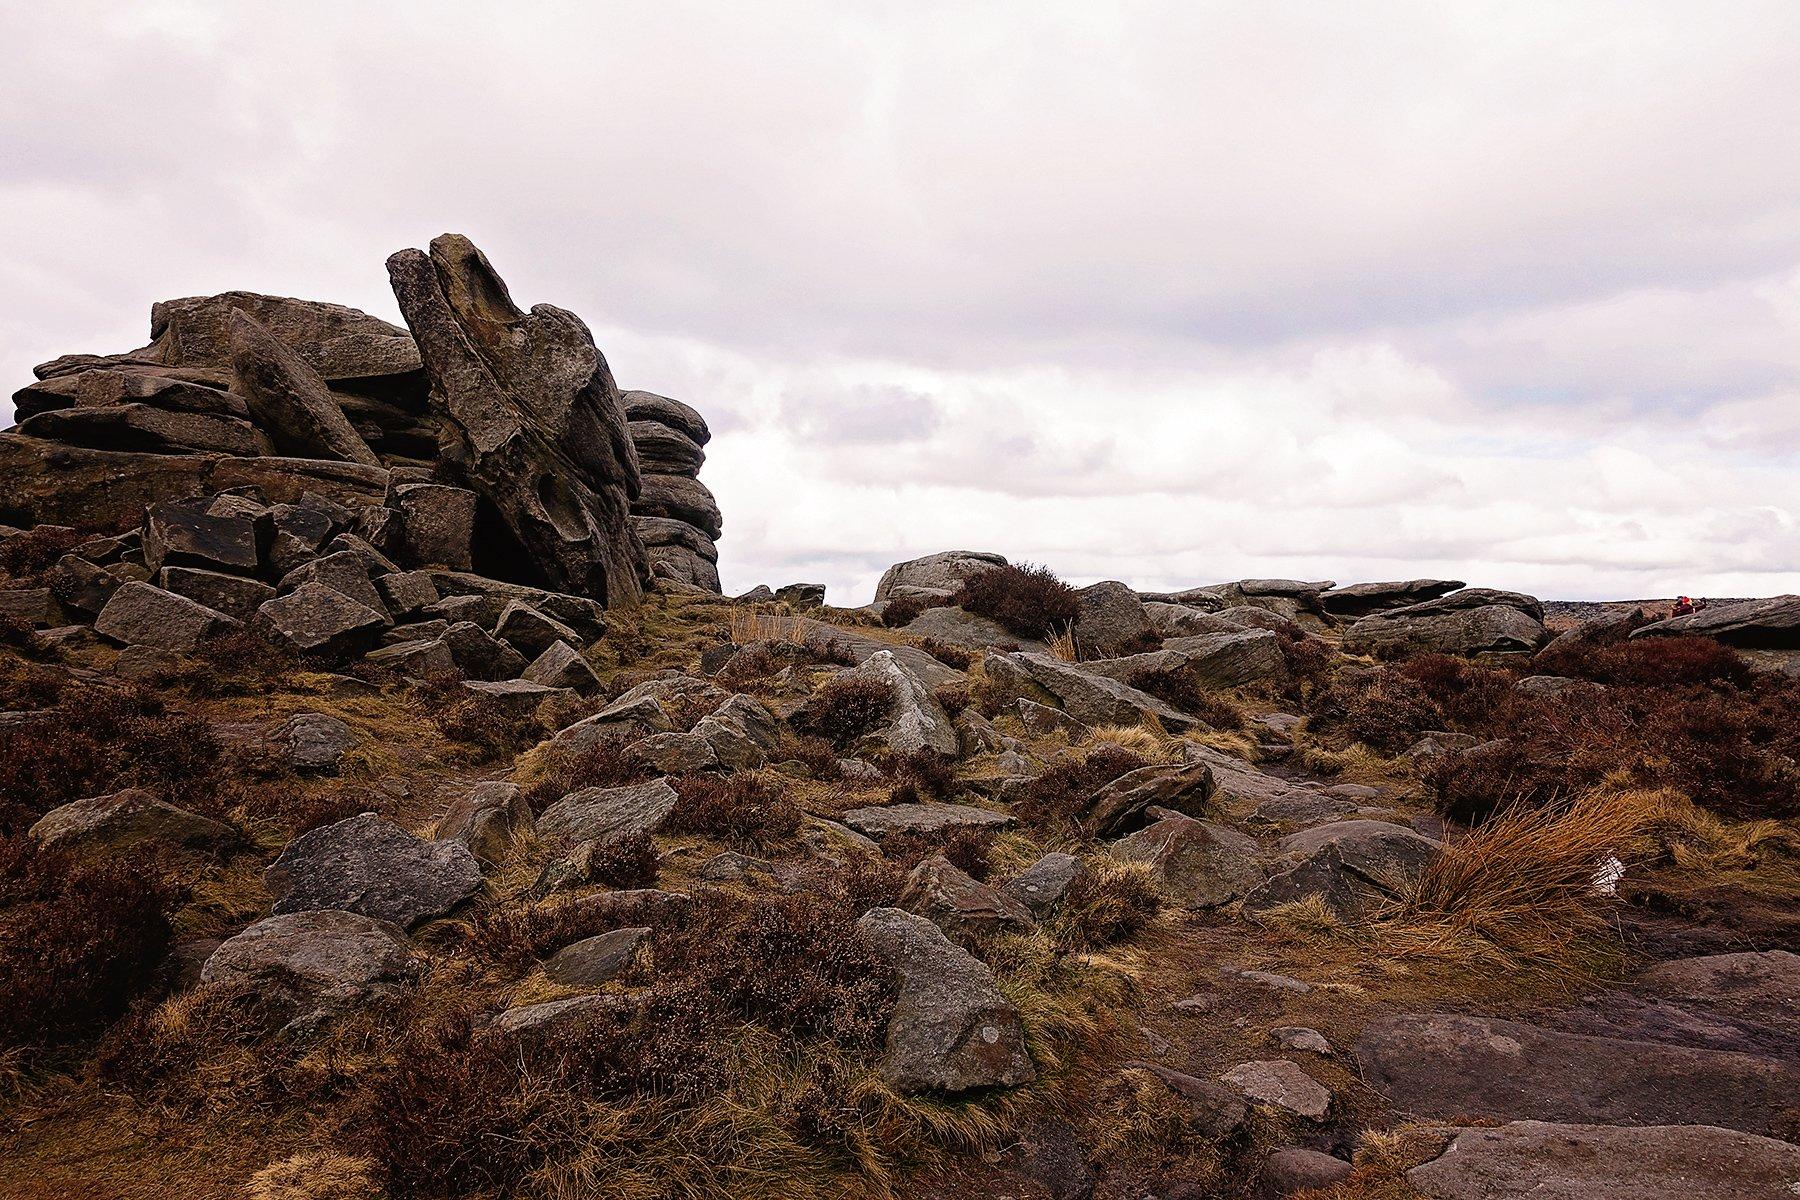 Longshaw to Upper Owler Tor walk